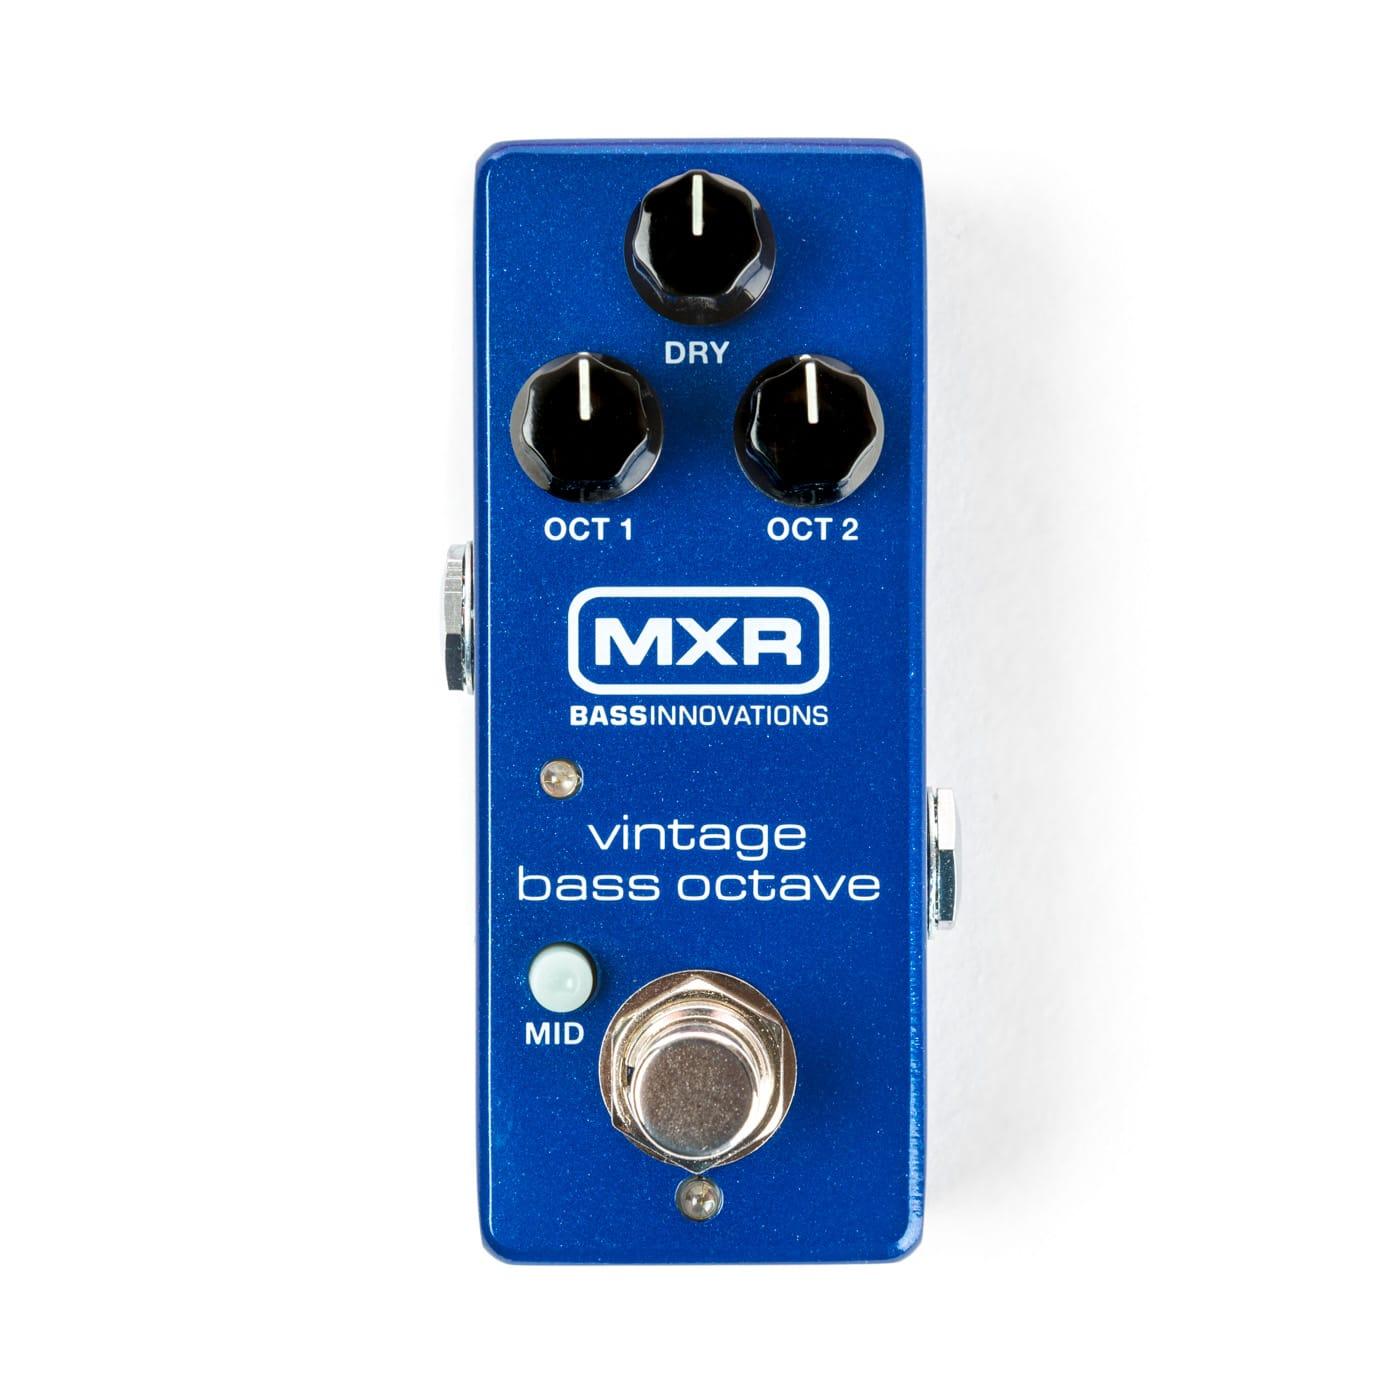 MXR   Electronics   Products 1400x1400